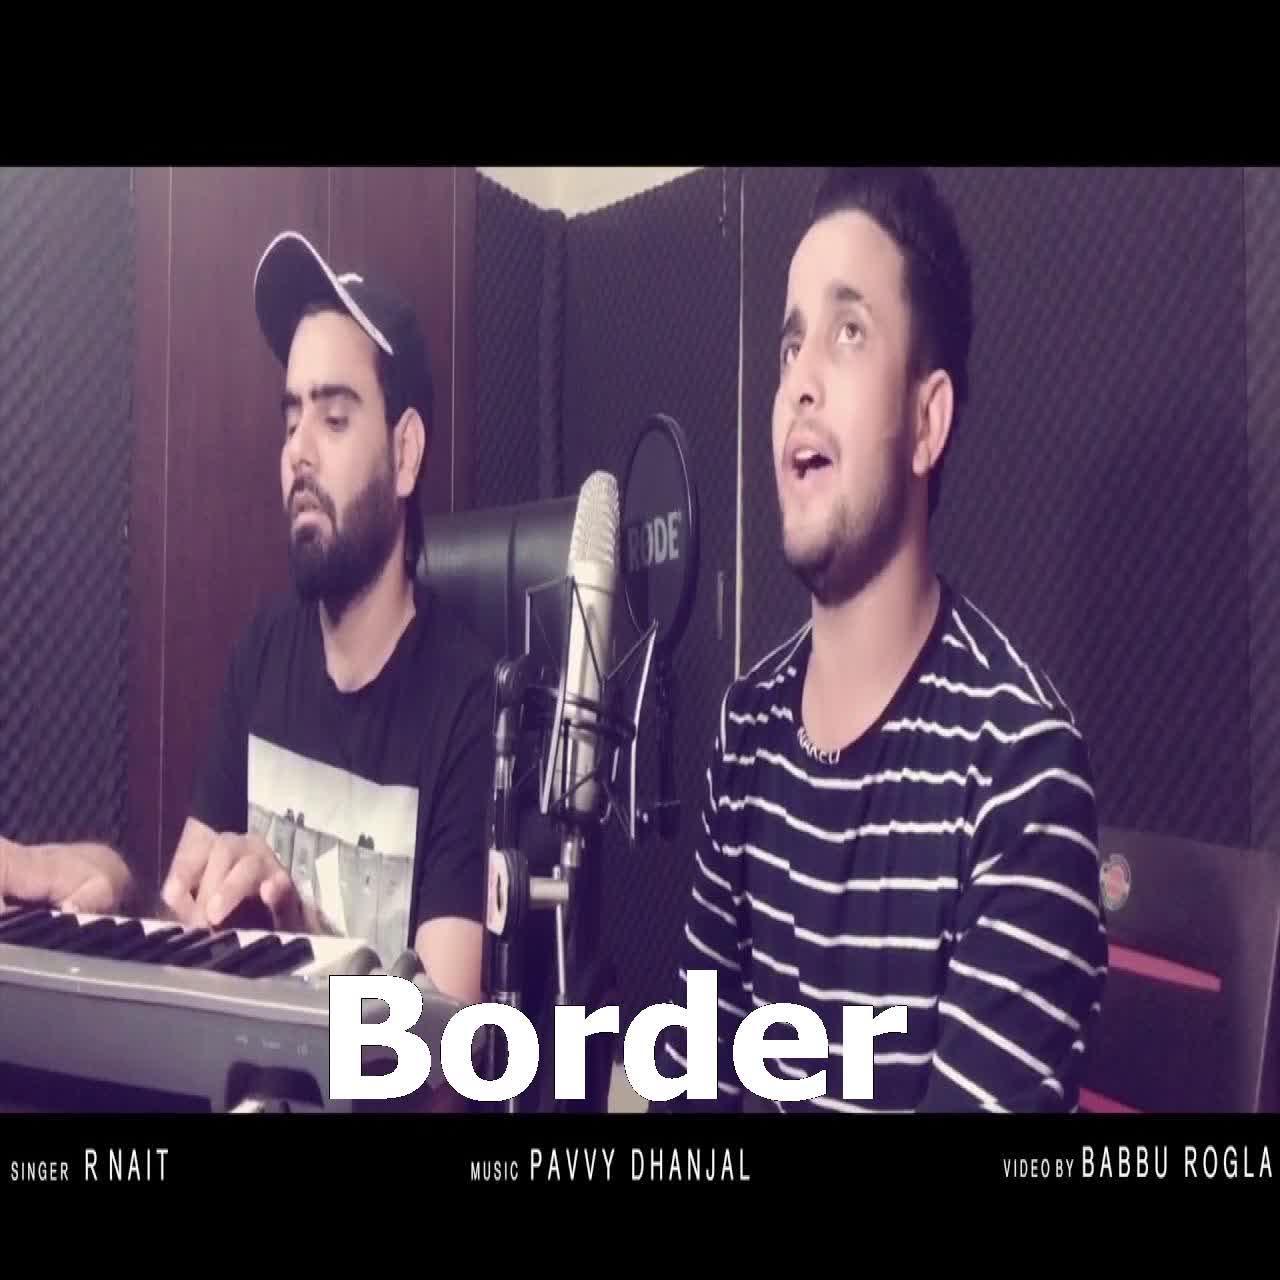 https://cover.djpunjab.org/42848/300x250/Border_R_Nait.jpg